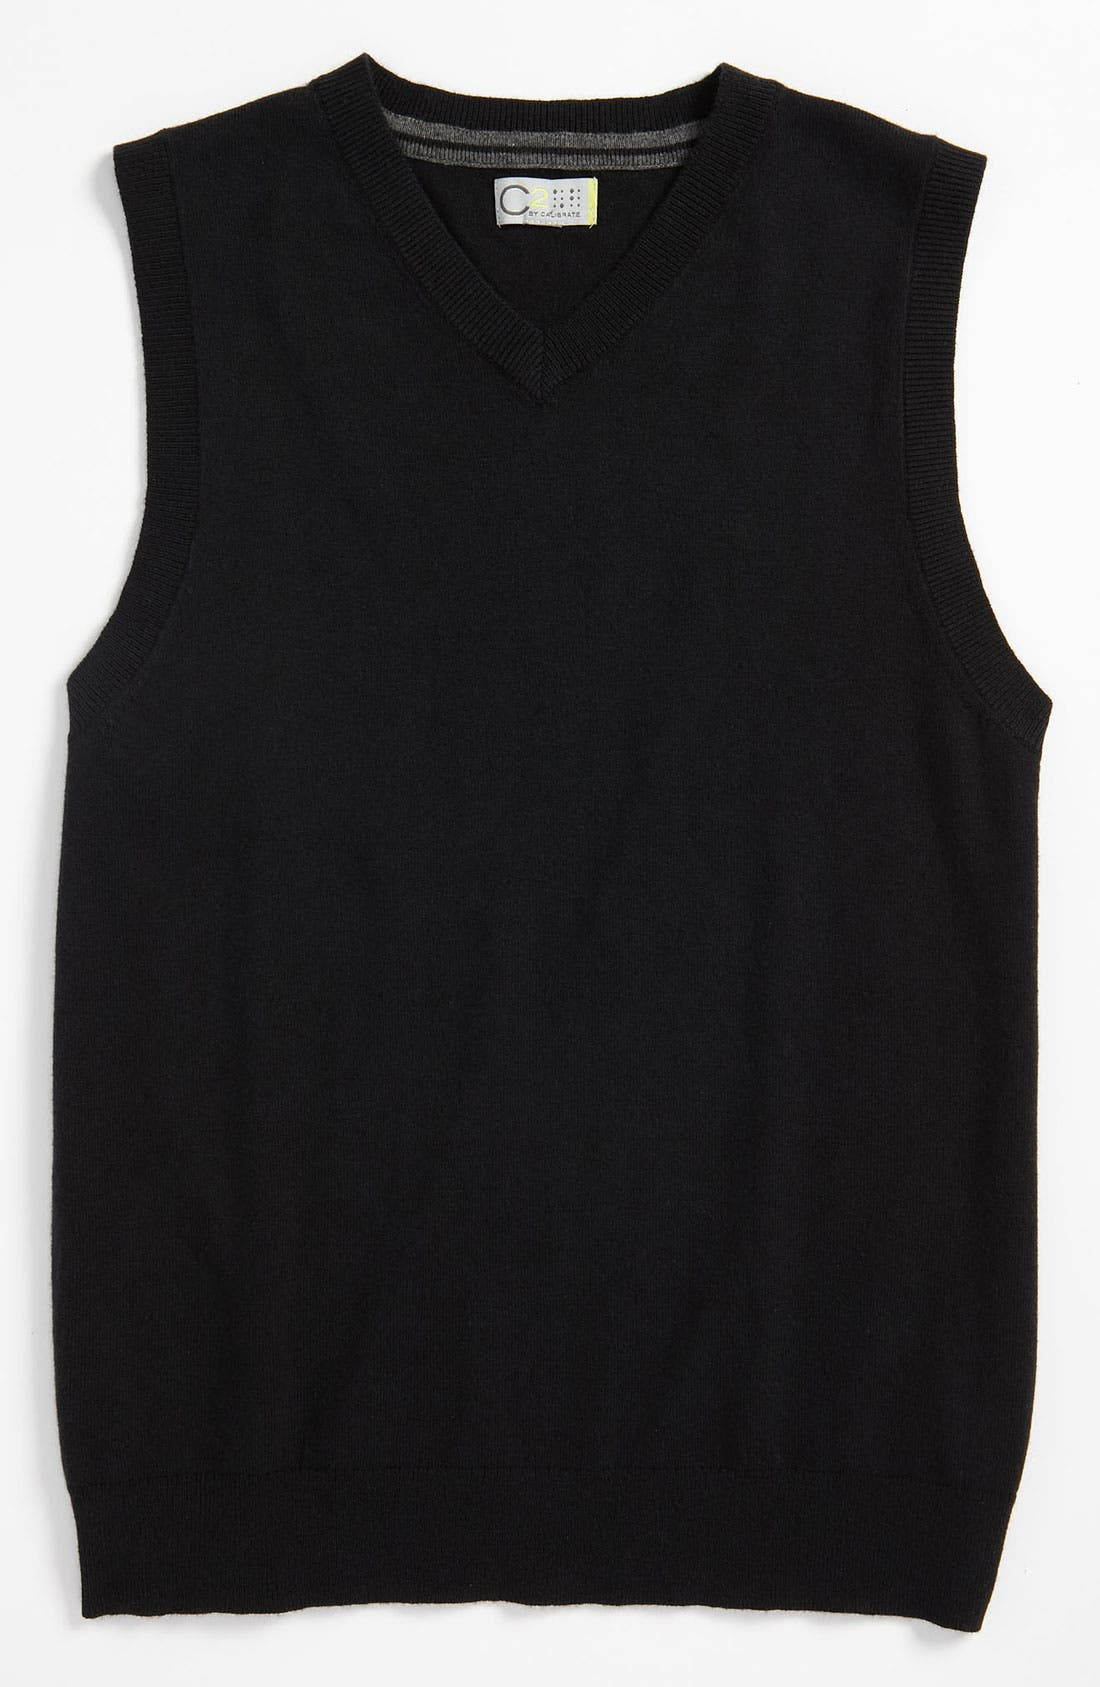 Main Image - C2 by Calibrate 'Eli' Sweater Vest (Big Boys)